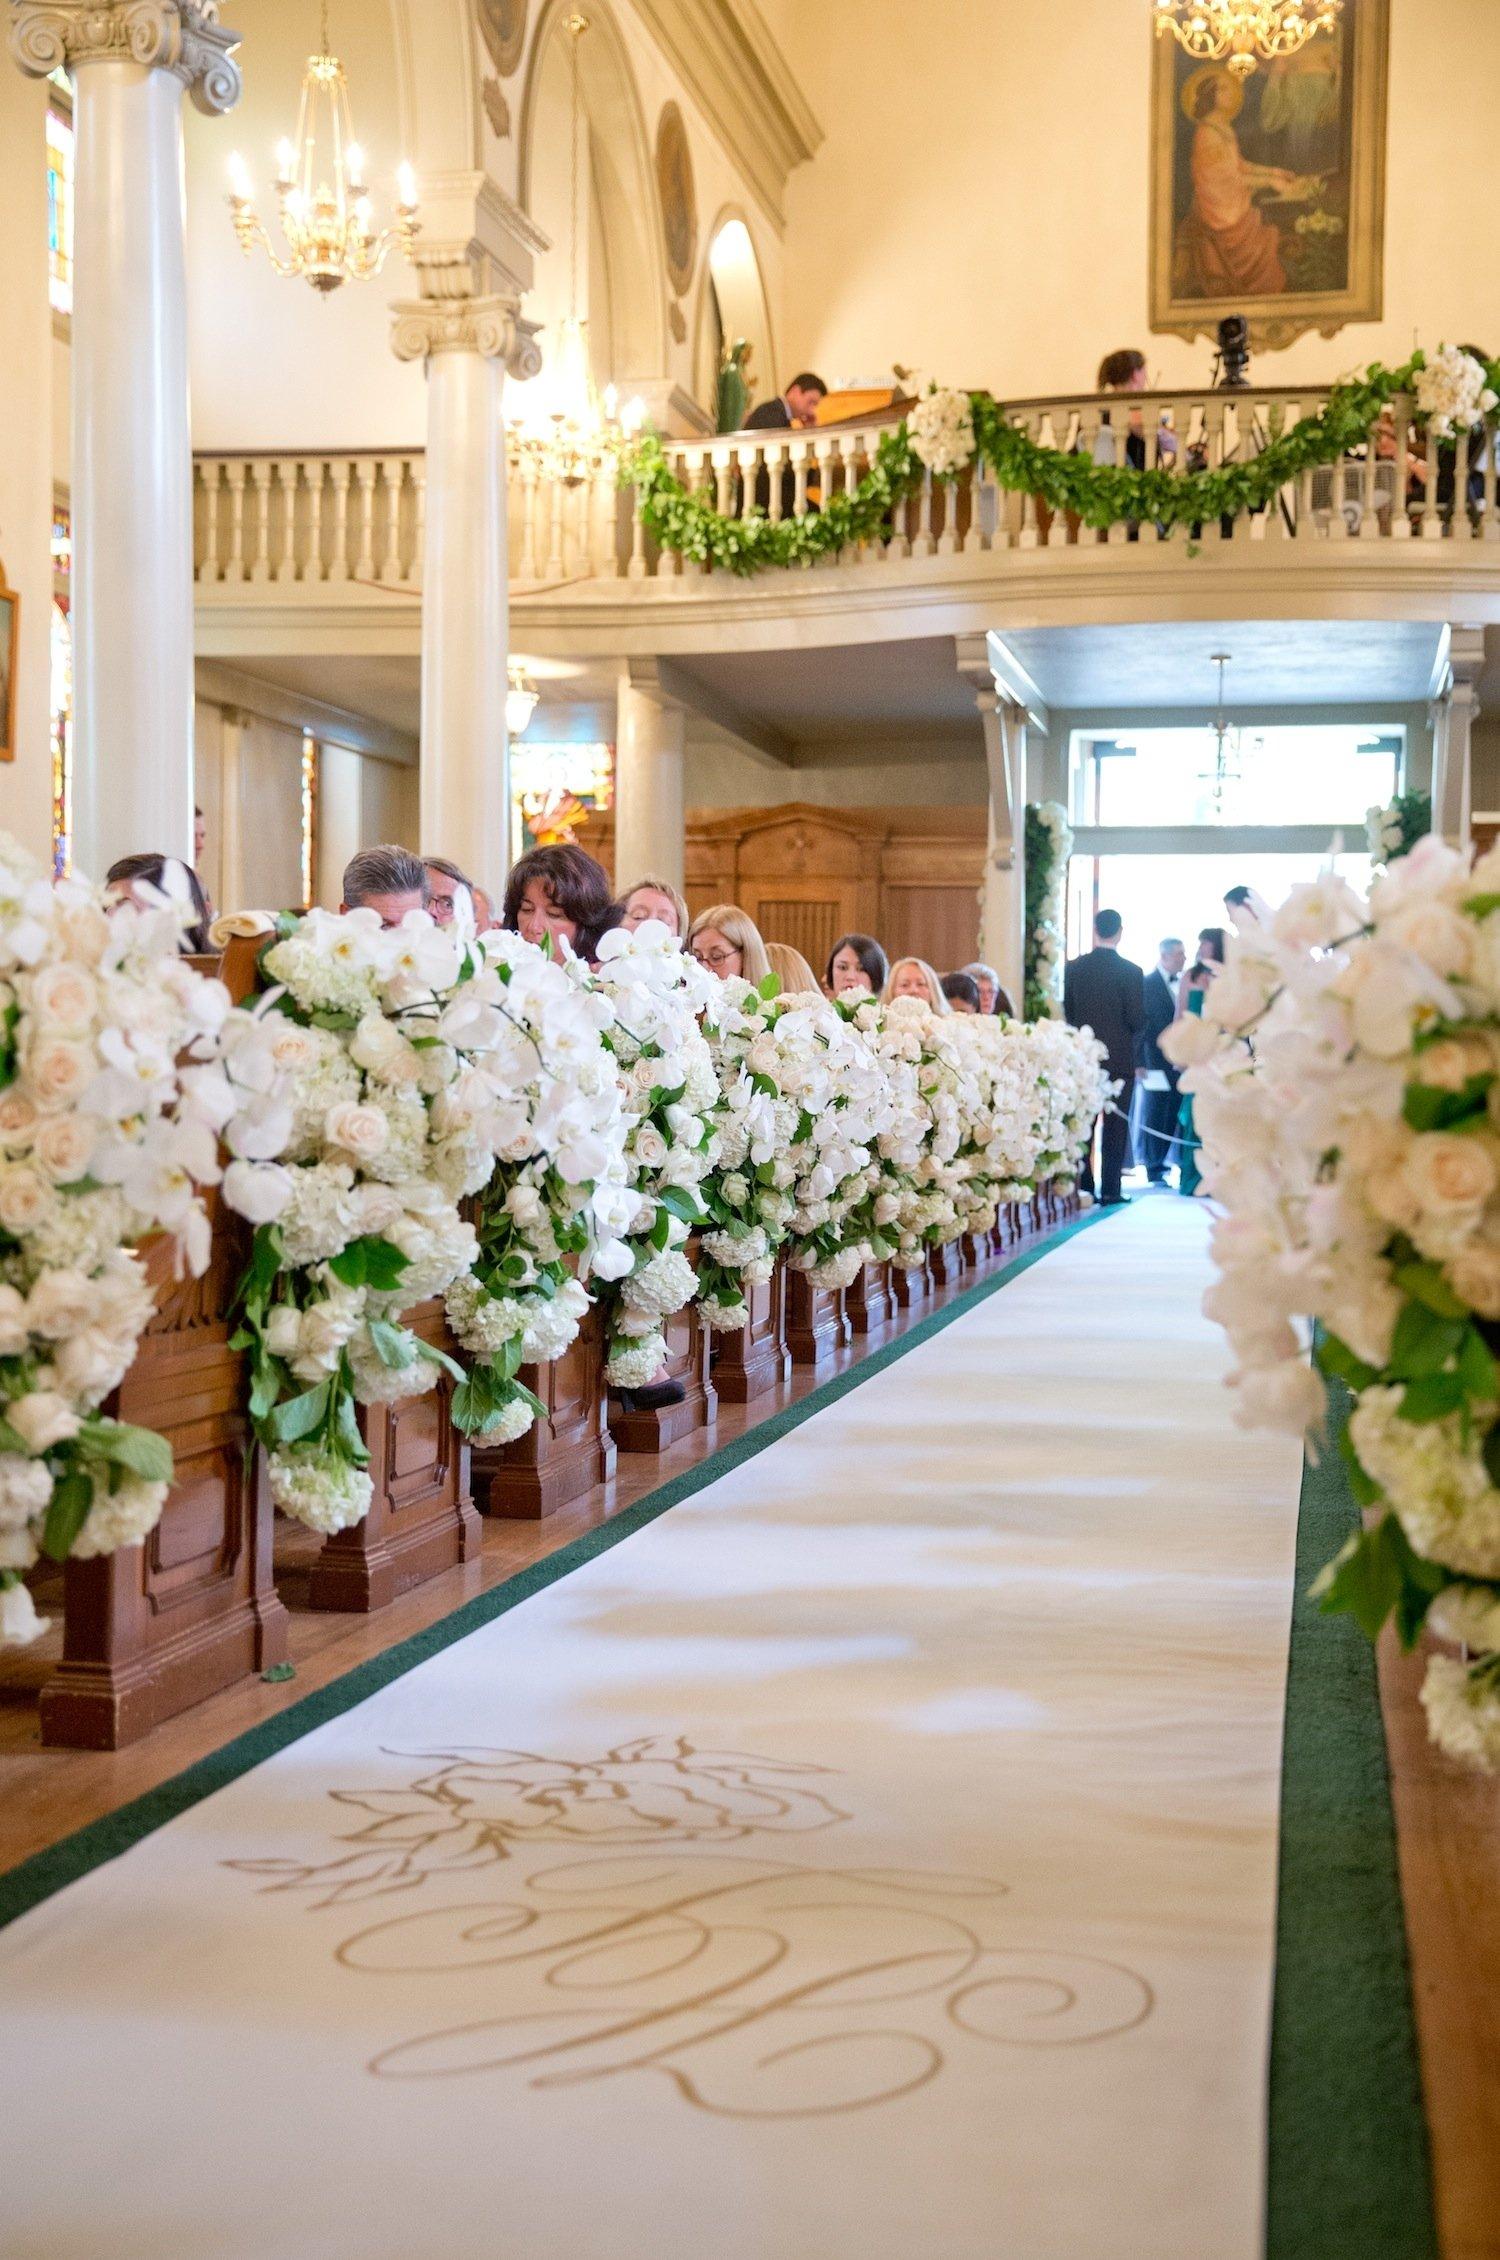 10 Great Wedding Decoration Ideas For Church wedding ceremony ideas 13 decor ideas for a church wedding inside